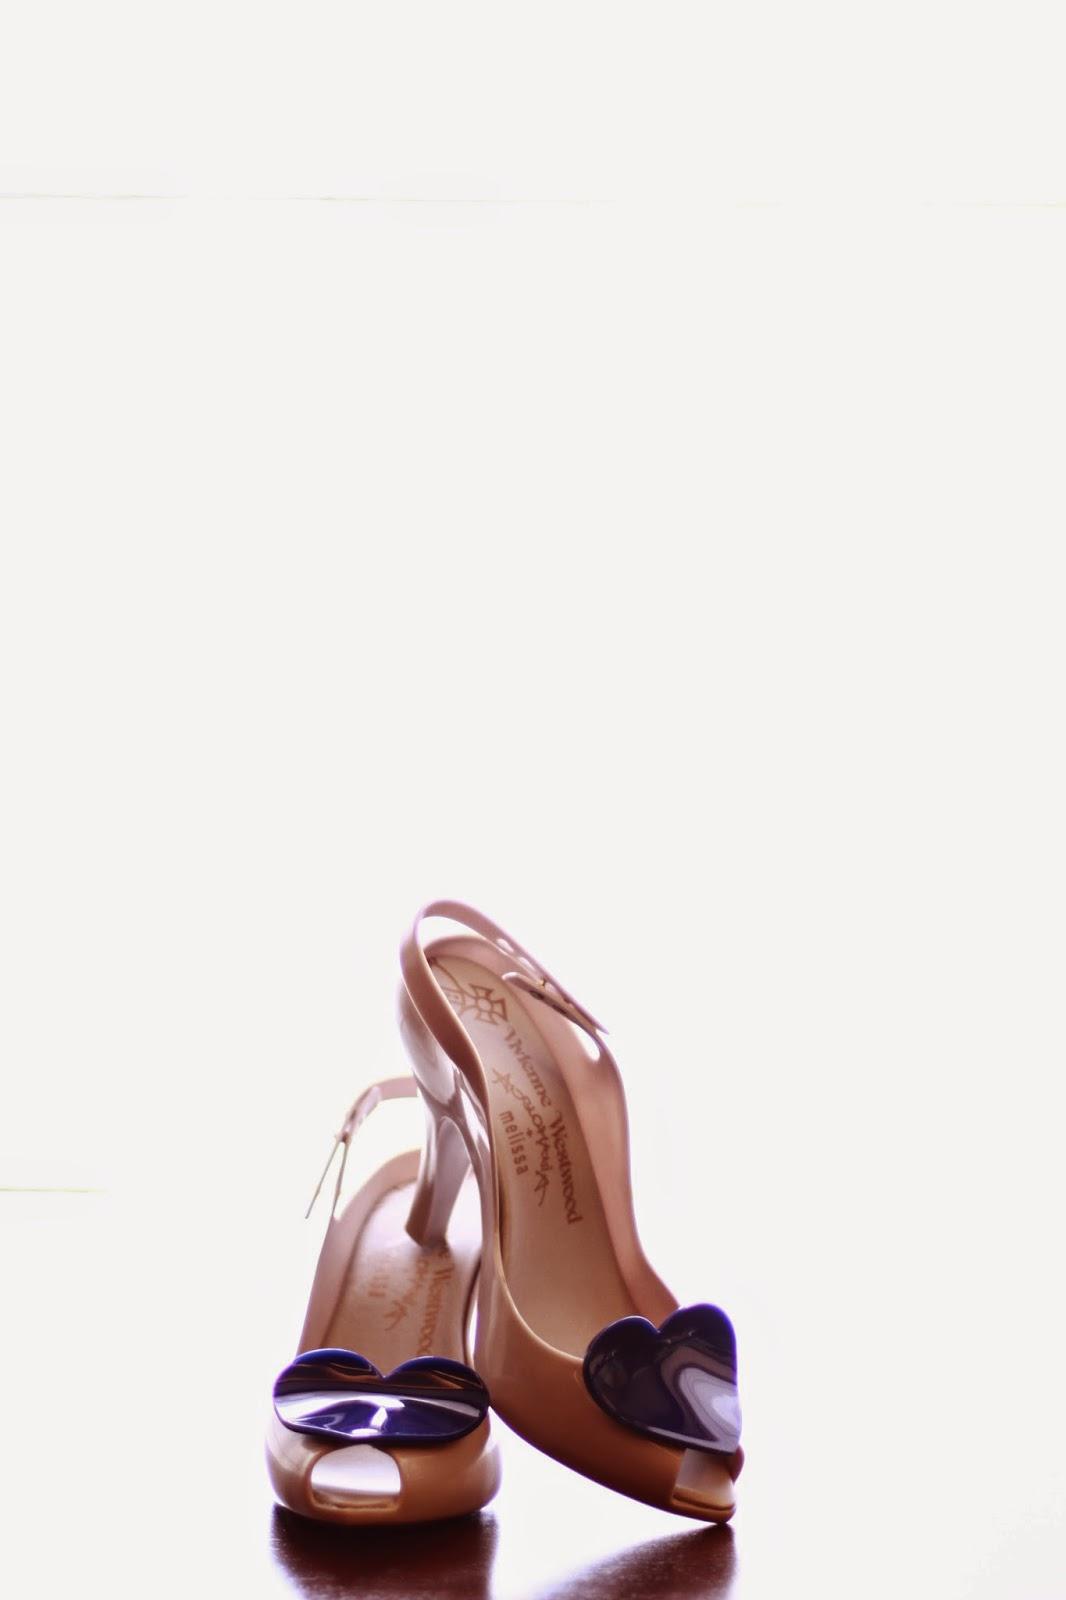 Vivienne Westwood Shoes Uk Ivory